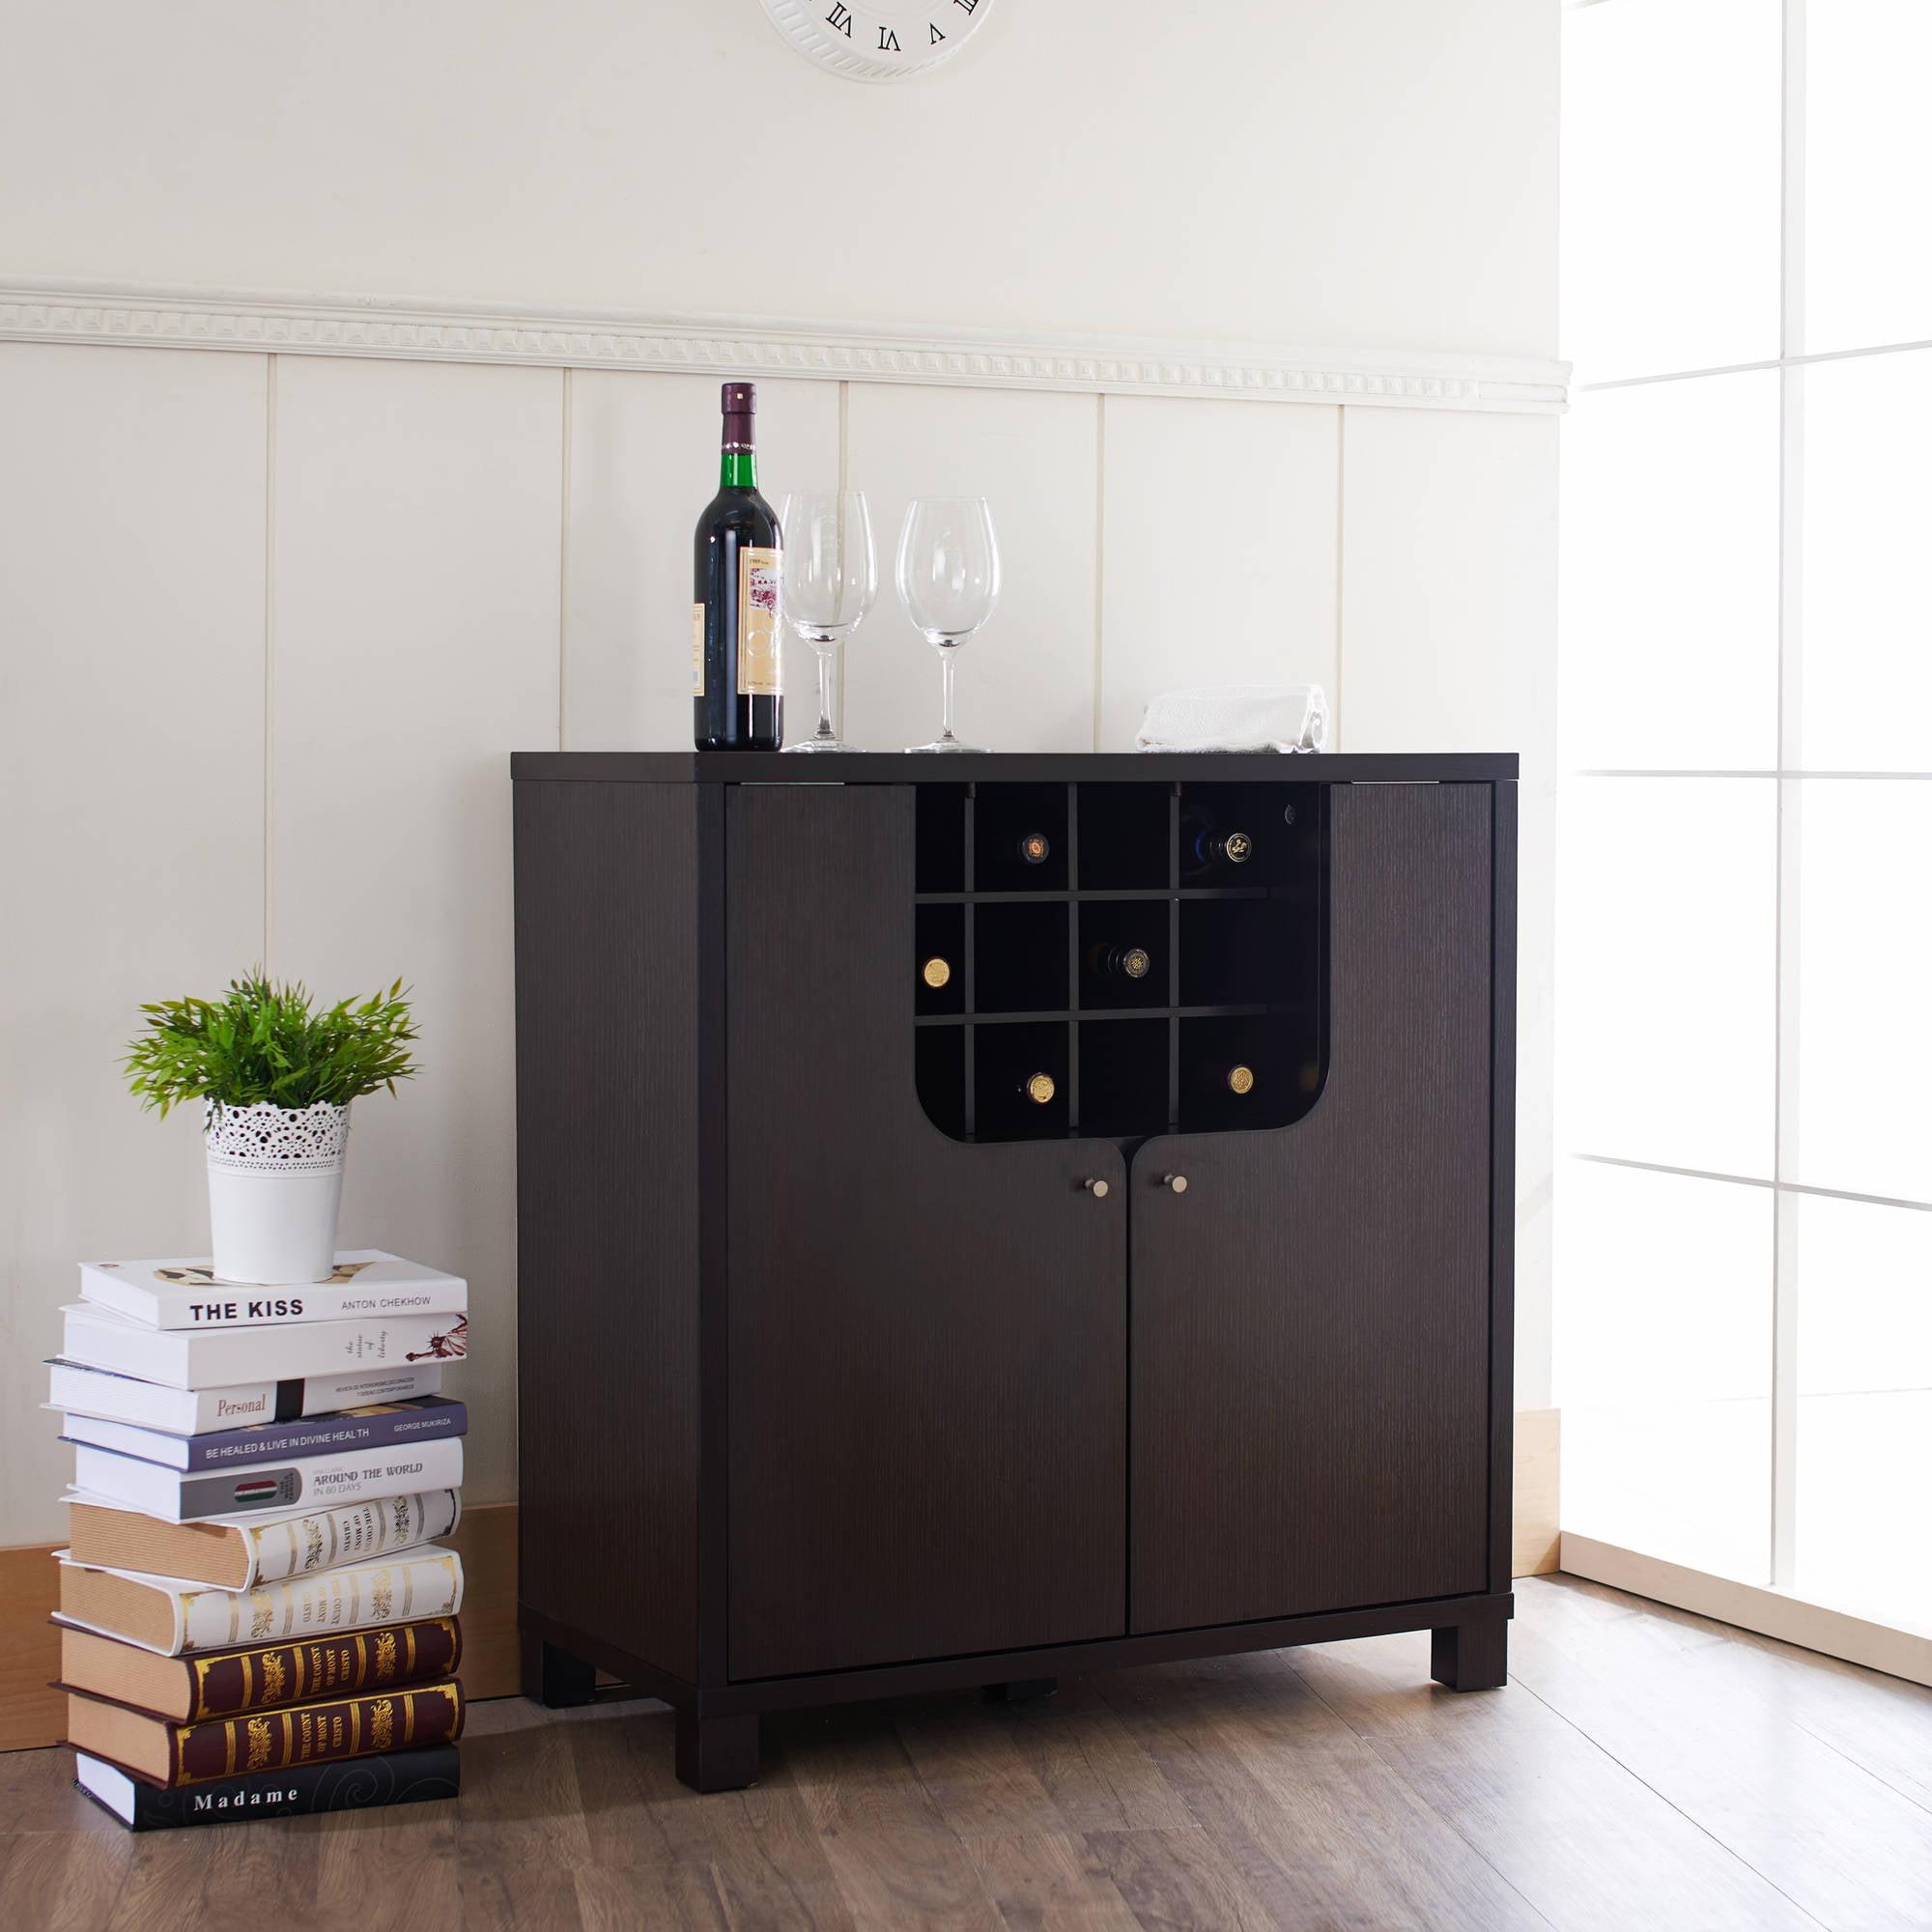 Furniture of America Greggors Modern Multi-Storage Wine Cabinet, Cappuccino by Furniture of America